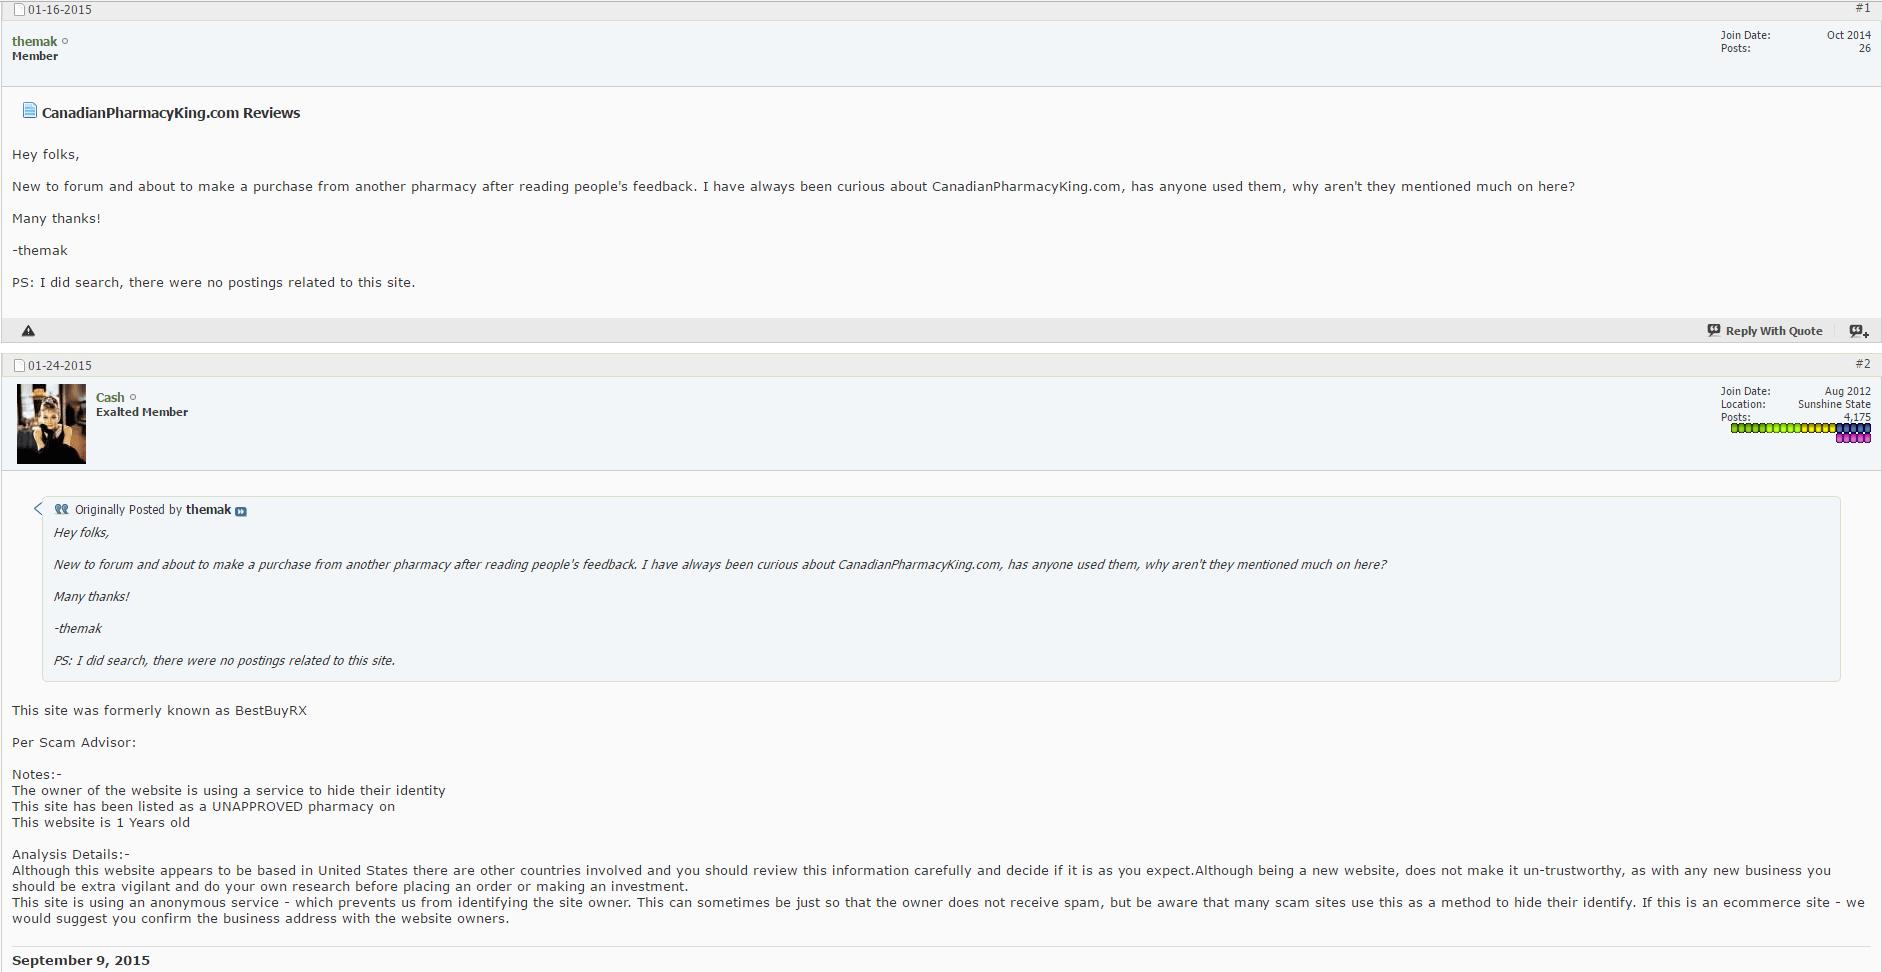 Canadianpharmacyking.com Reviews